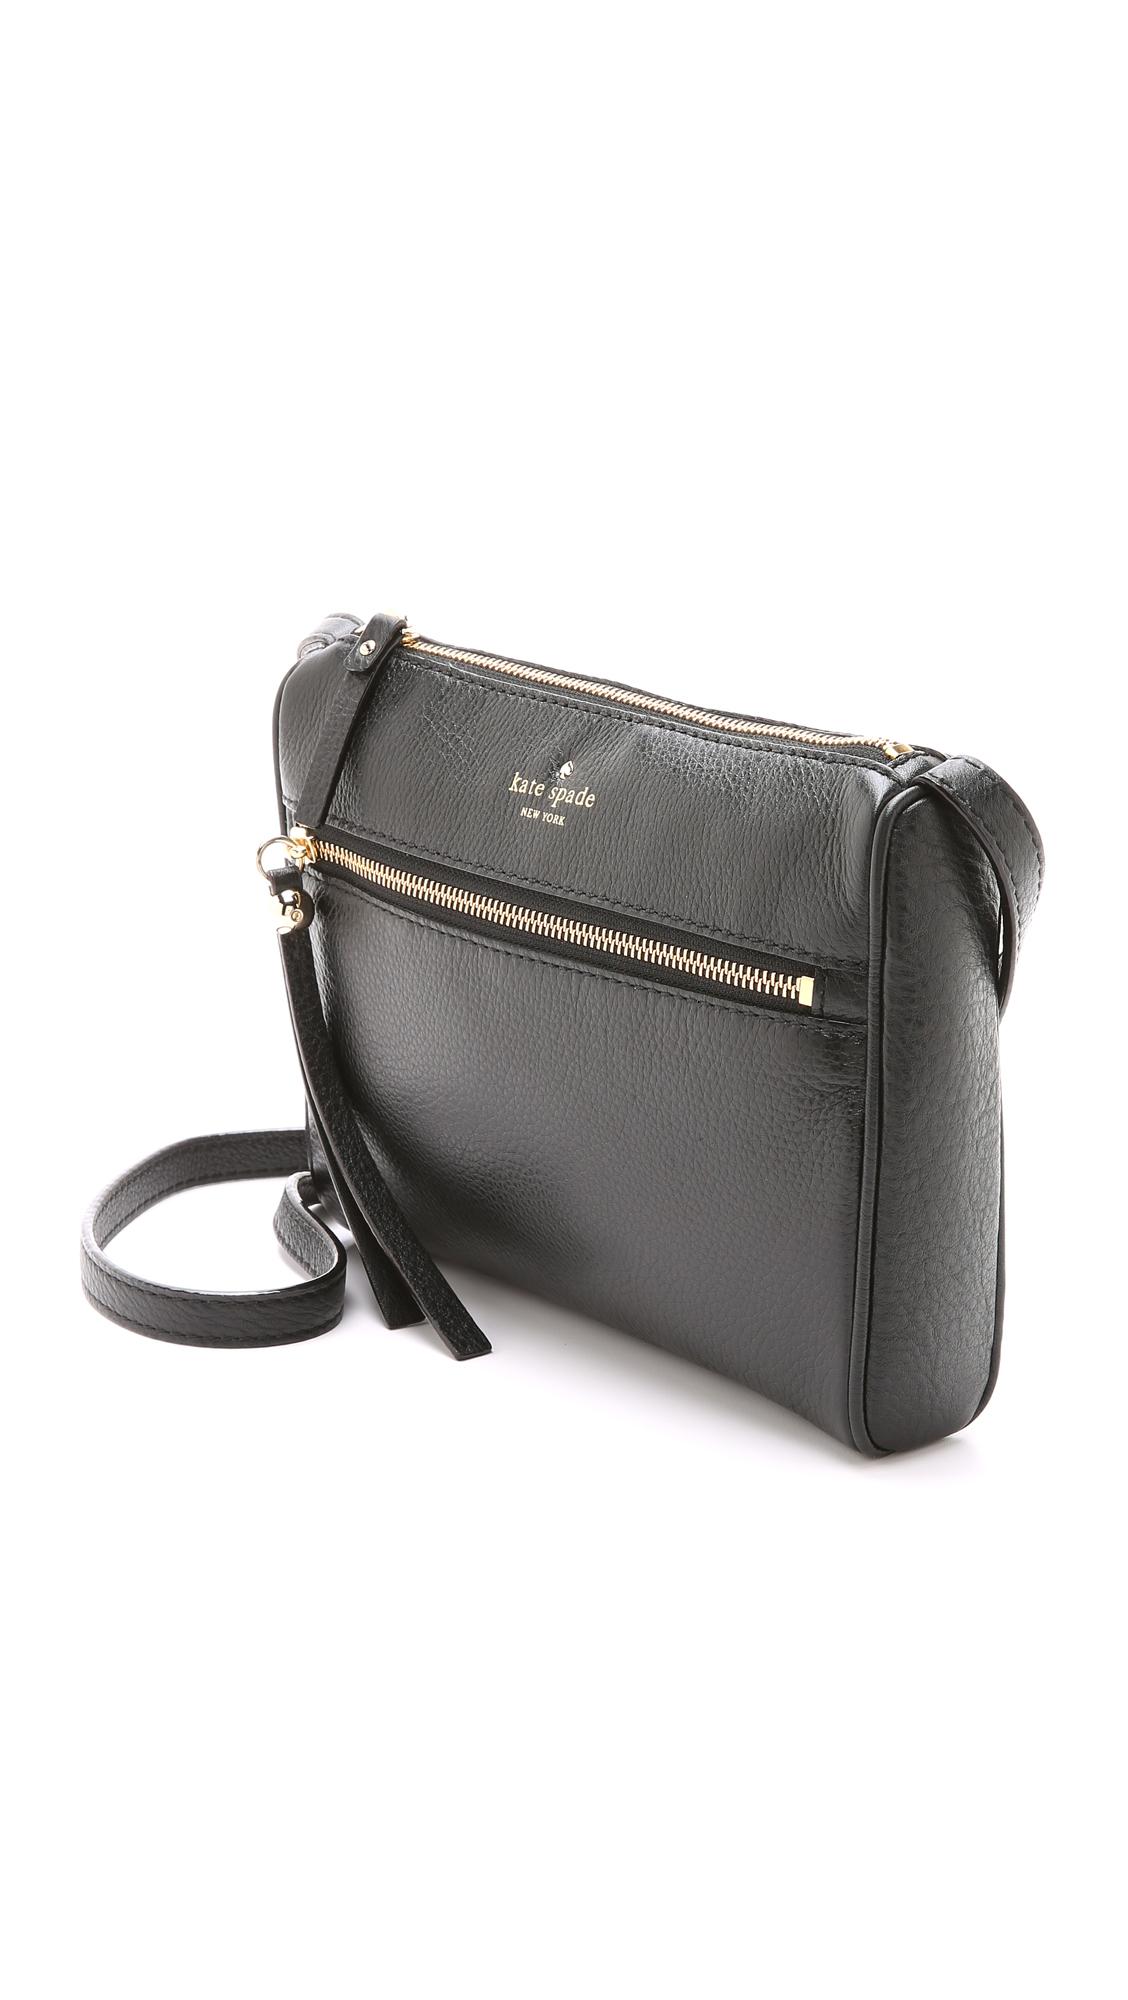 Lyst Kate Spade New York Cayli Cross Body Bag In Black